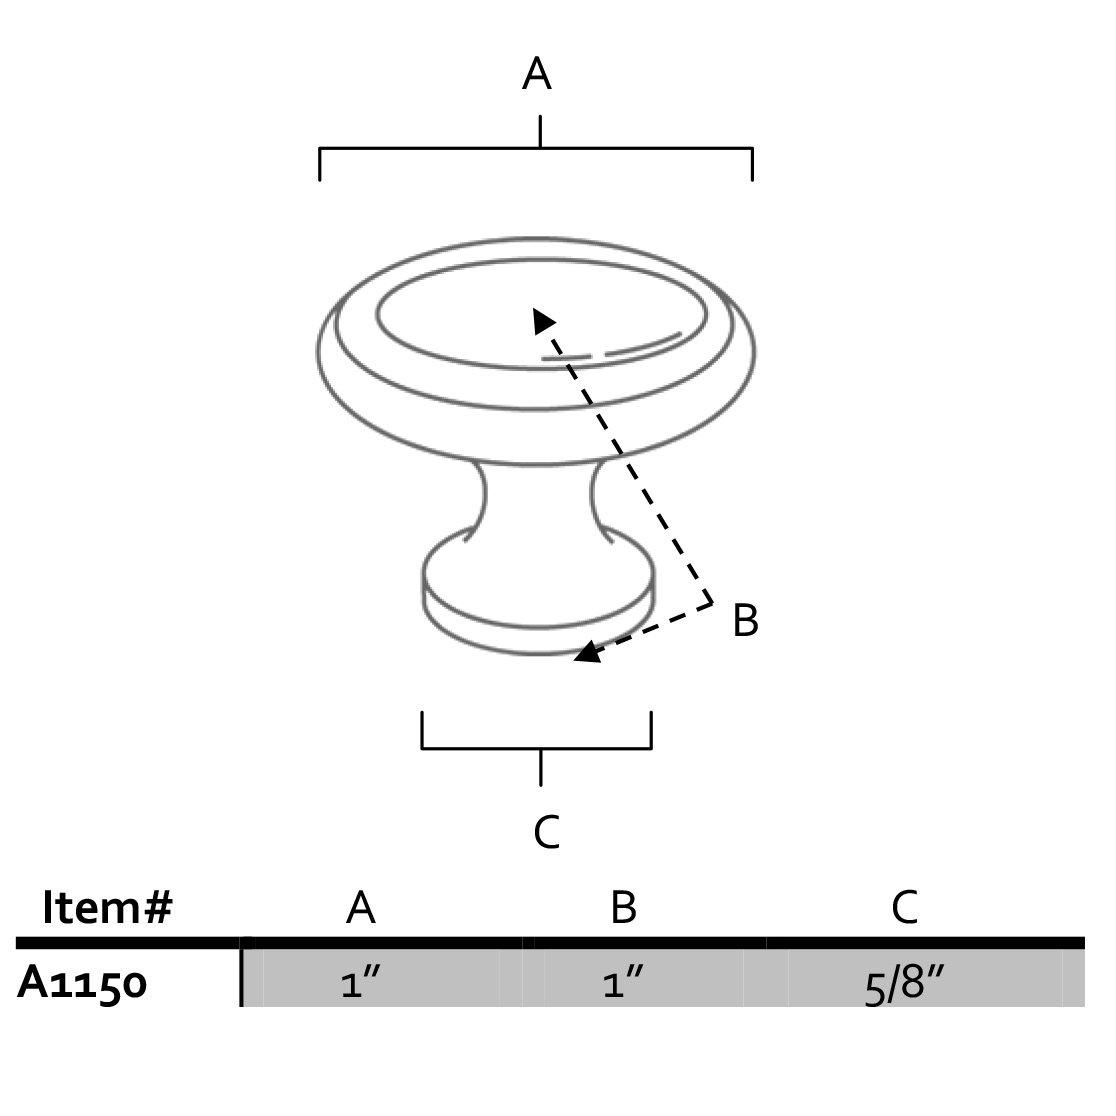 Alno Creations Shop: A1150-AEM